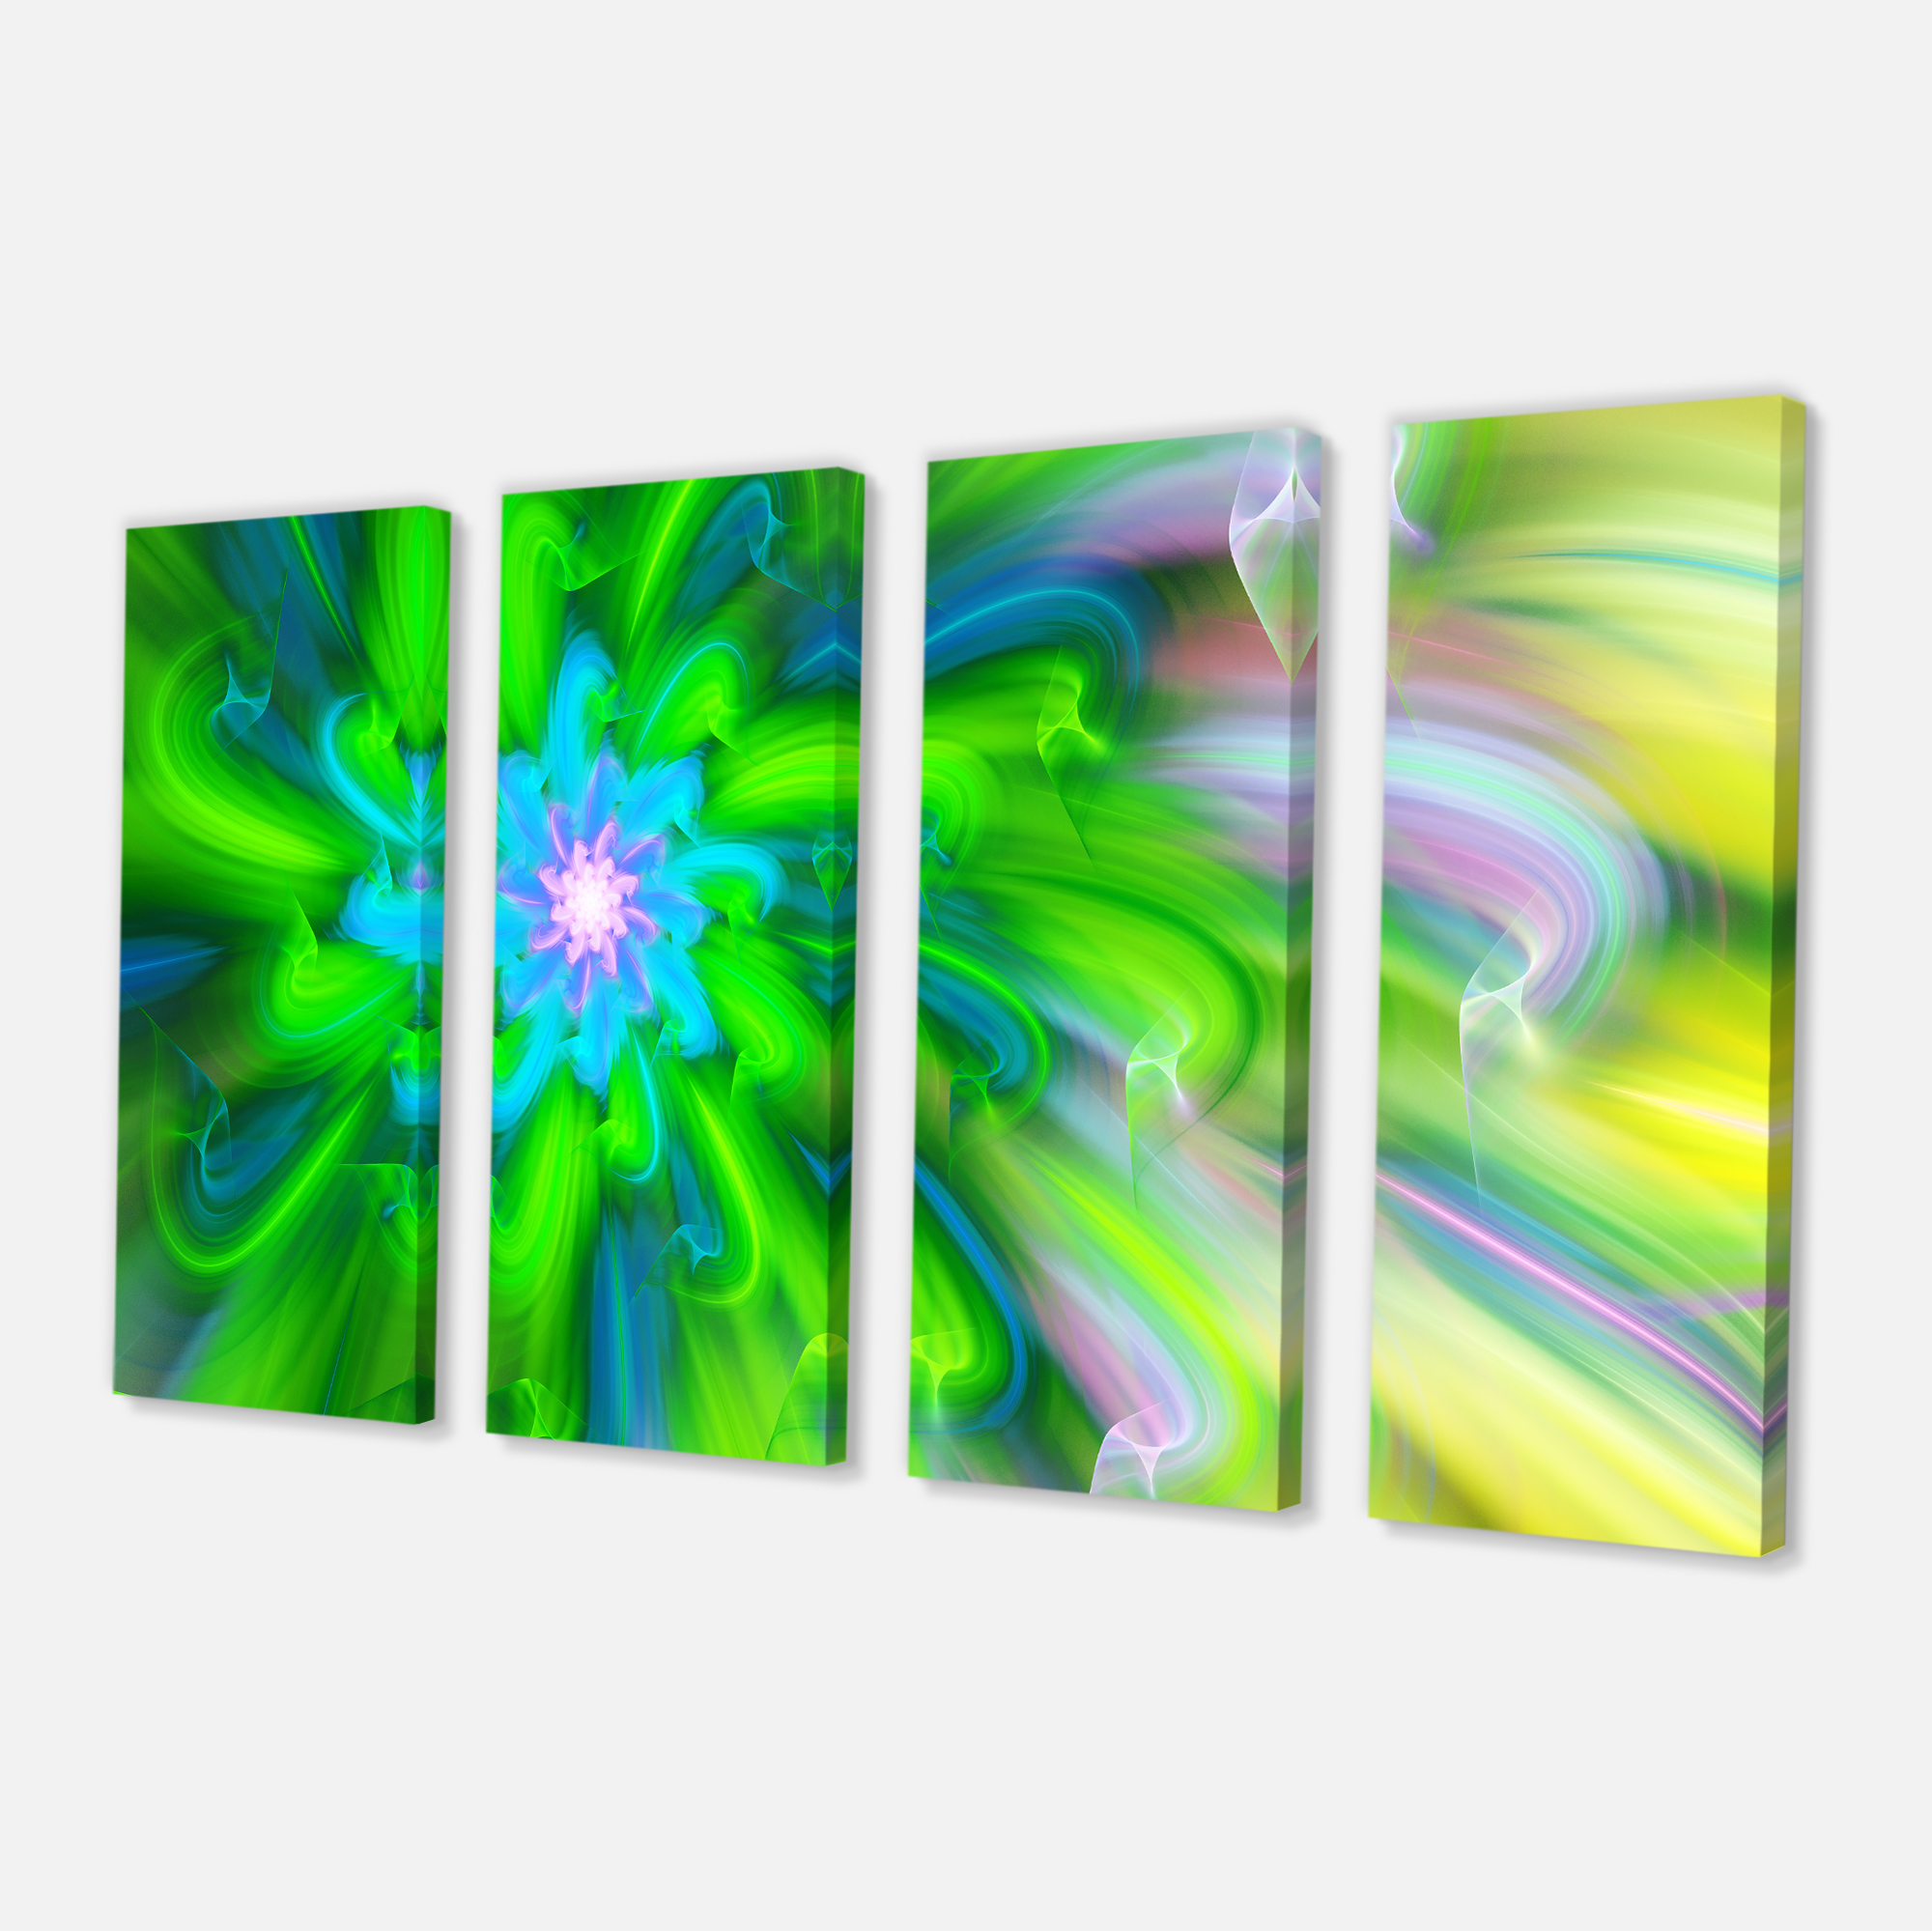 Dance of Green Flower Petals - Floral Canvas Art Print - image 2 de 3